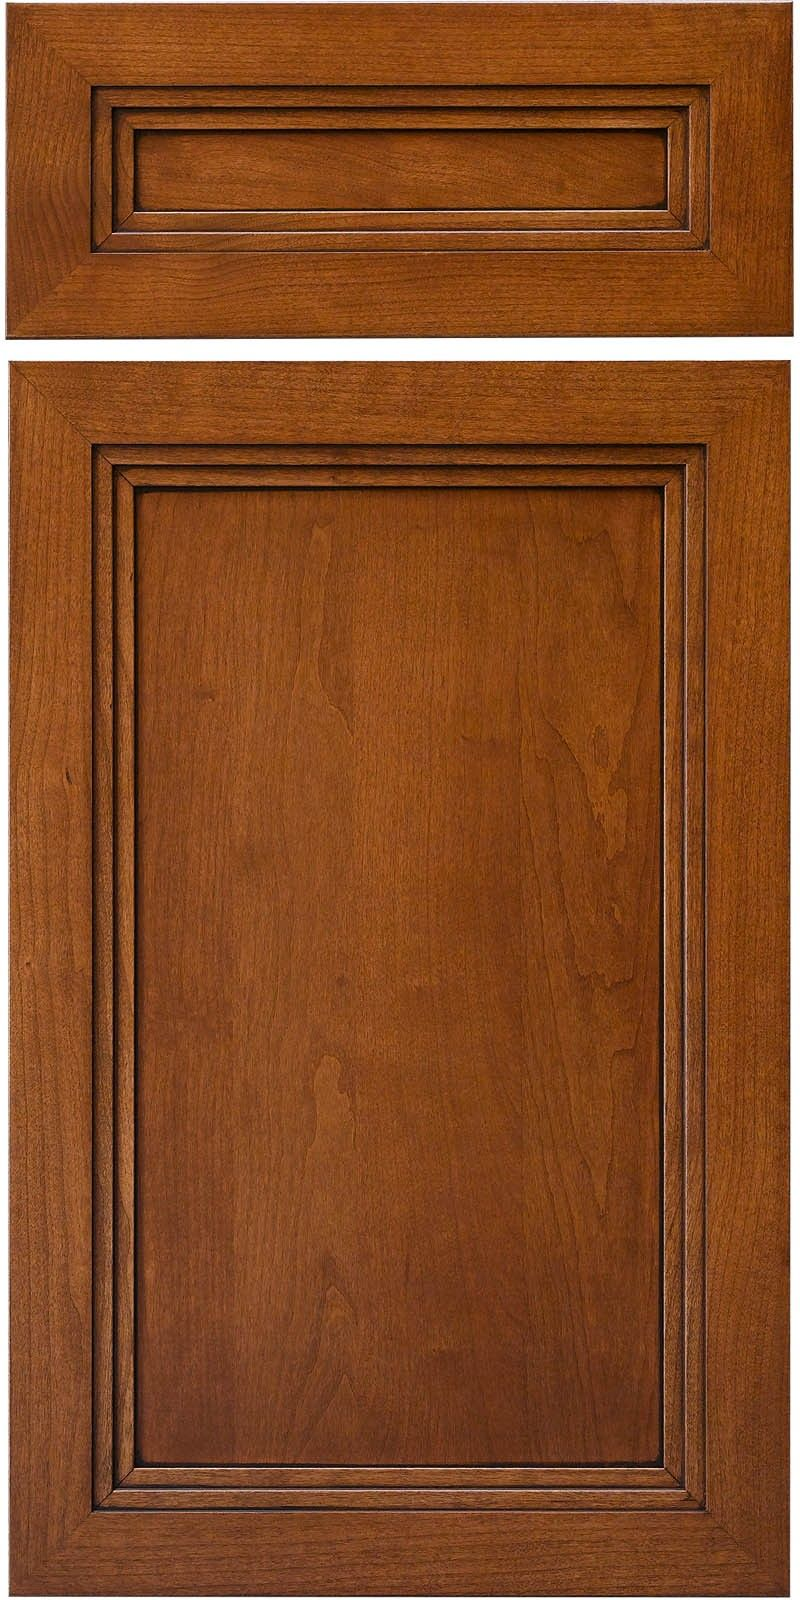 Crp10382 Cabinet Styles Cabinet Doors Traditional Design